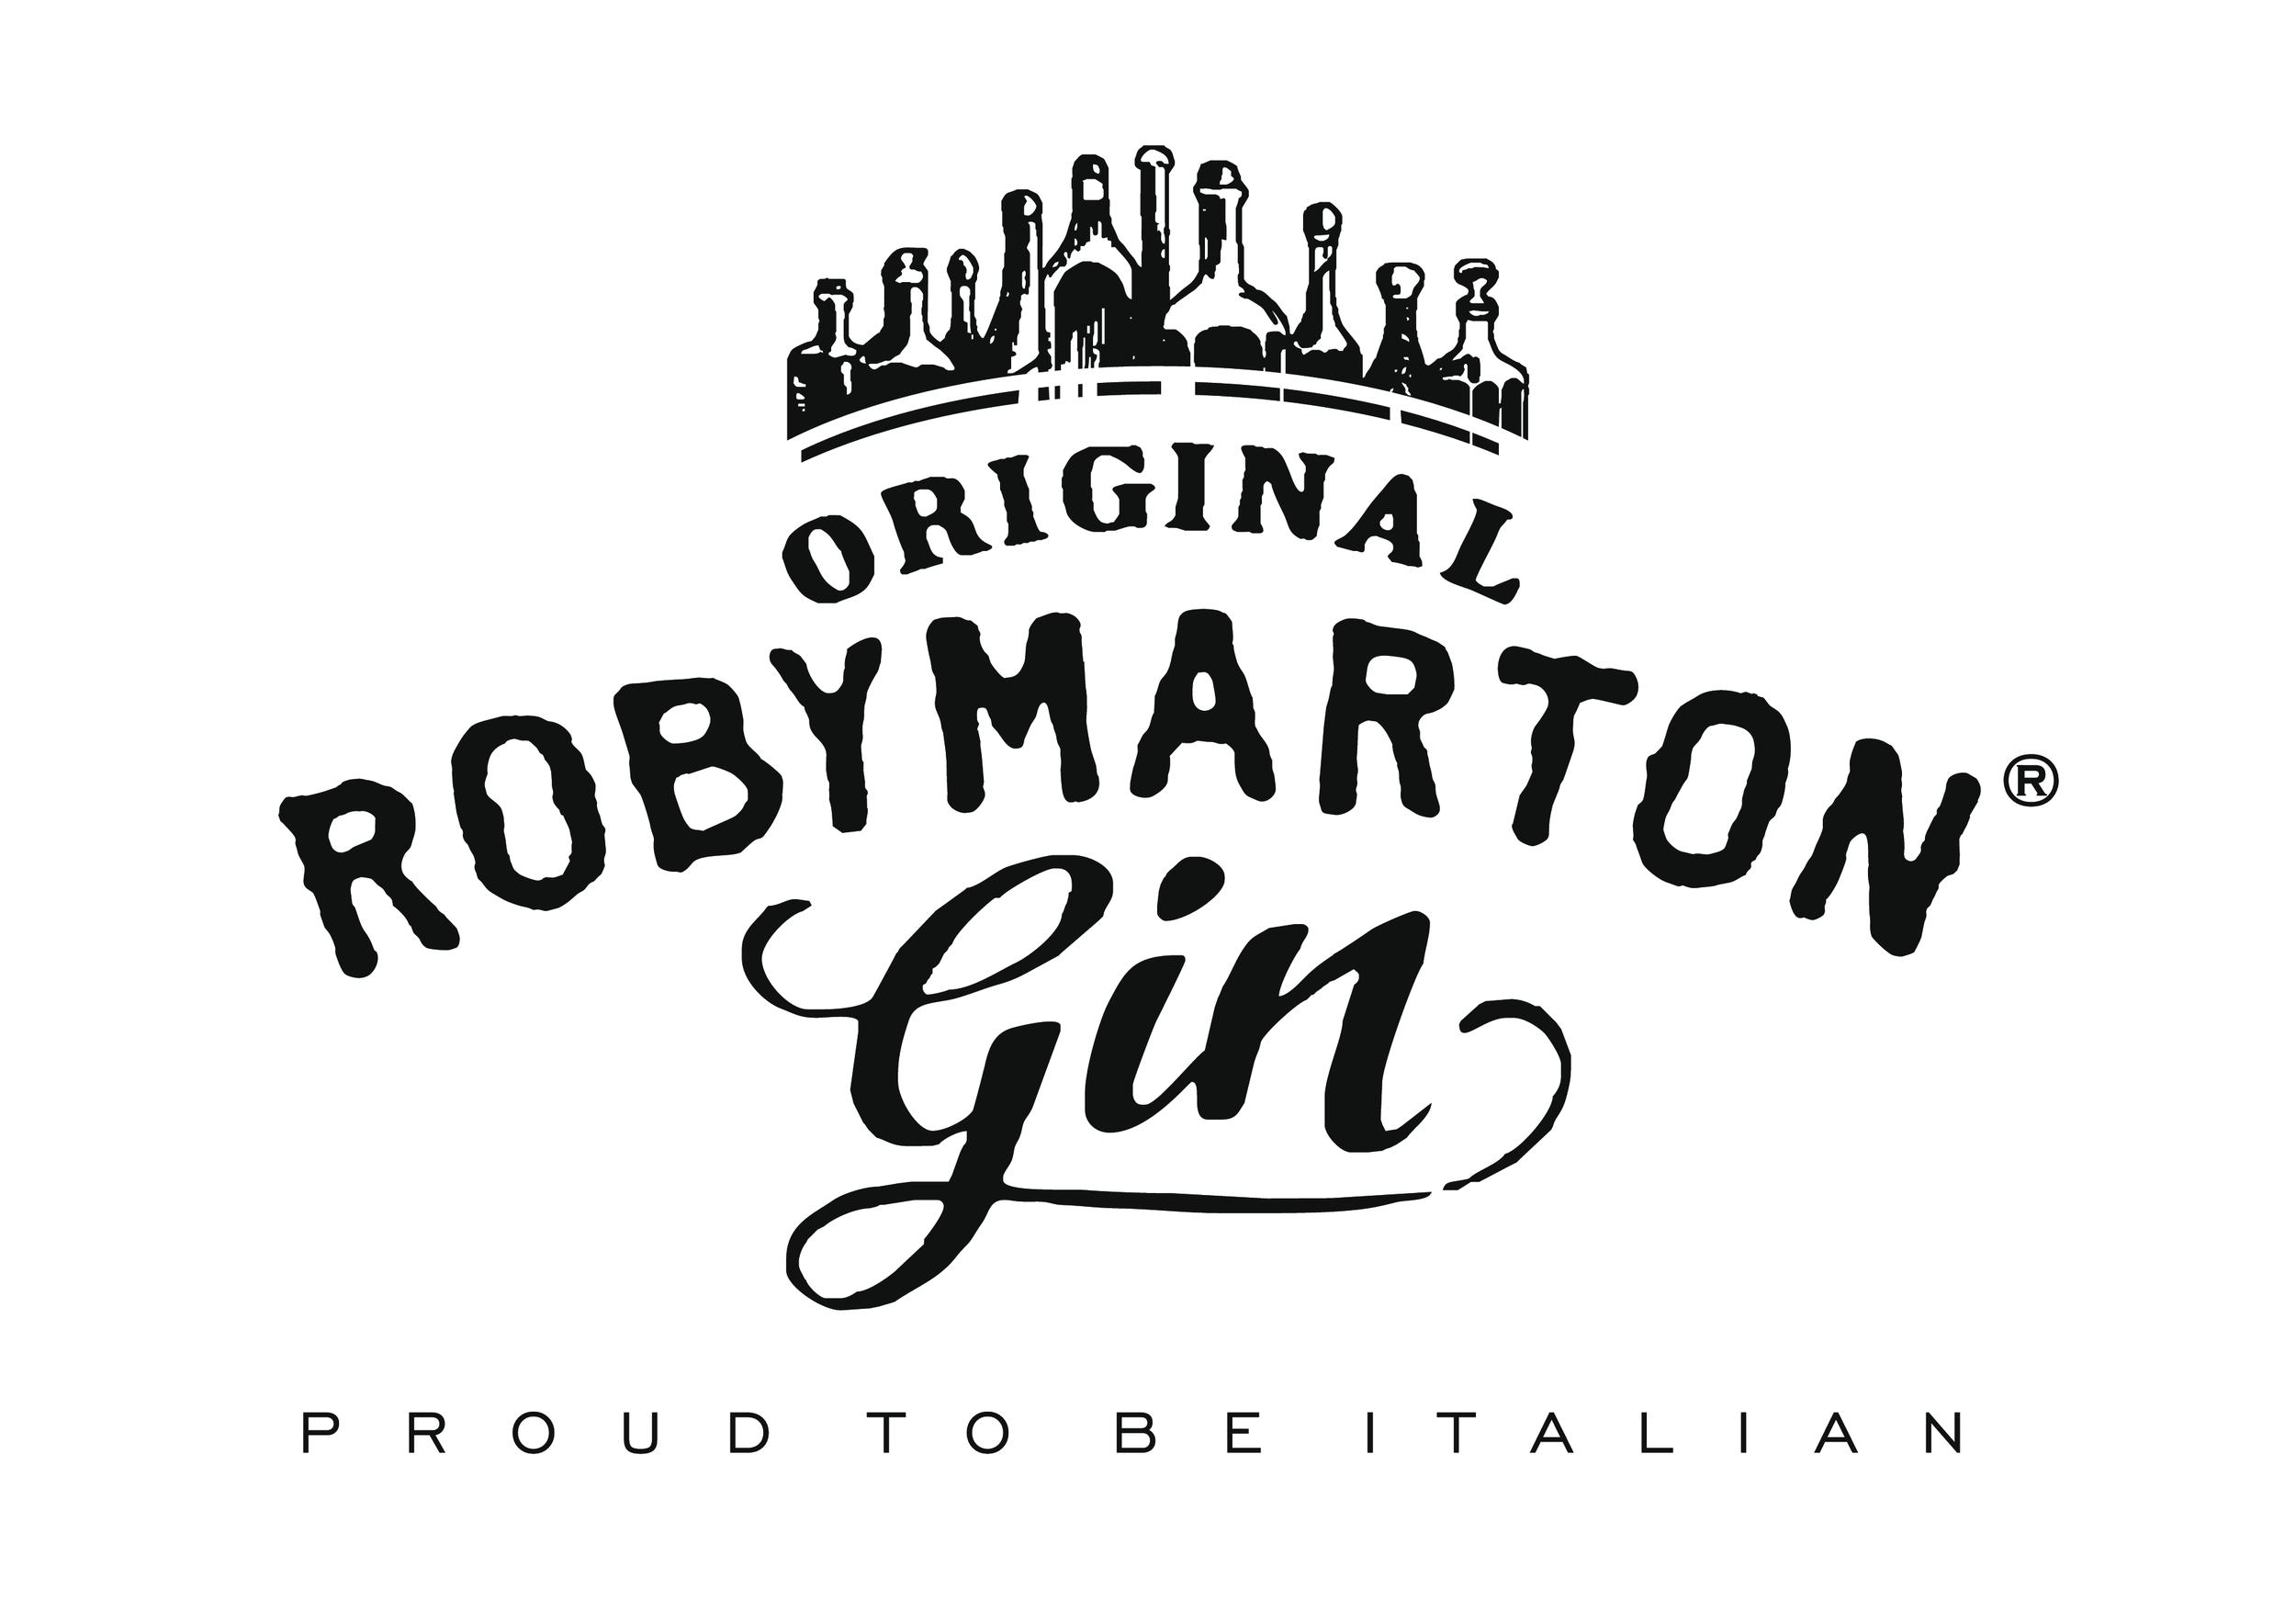 Robymarton Logo.png